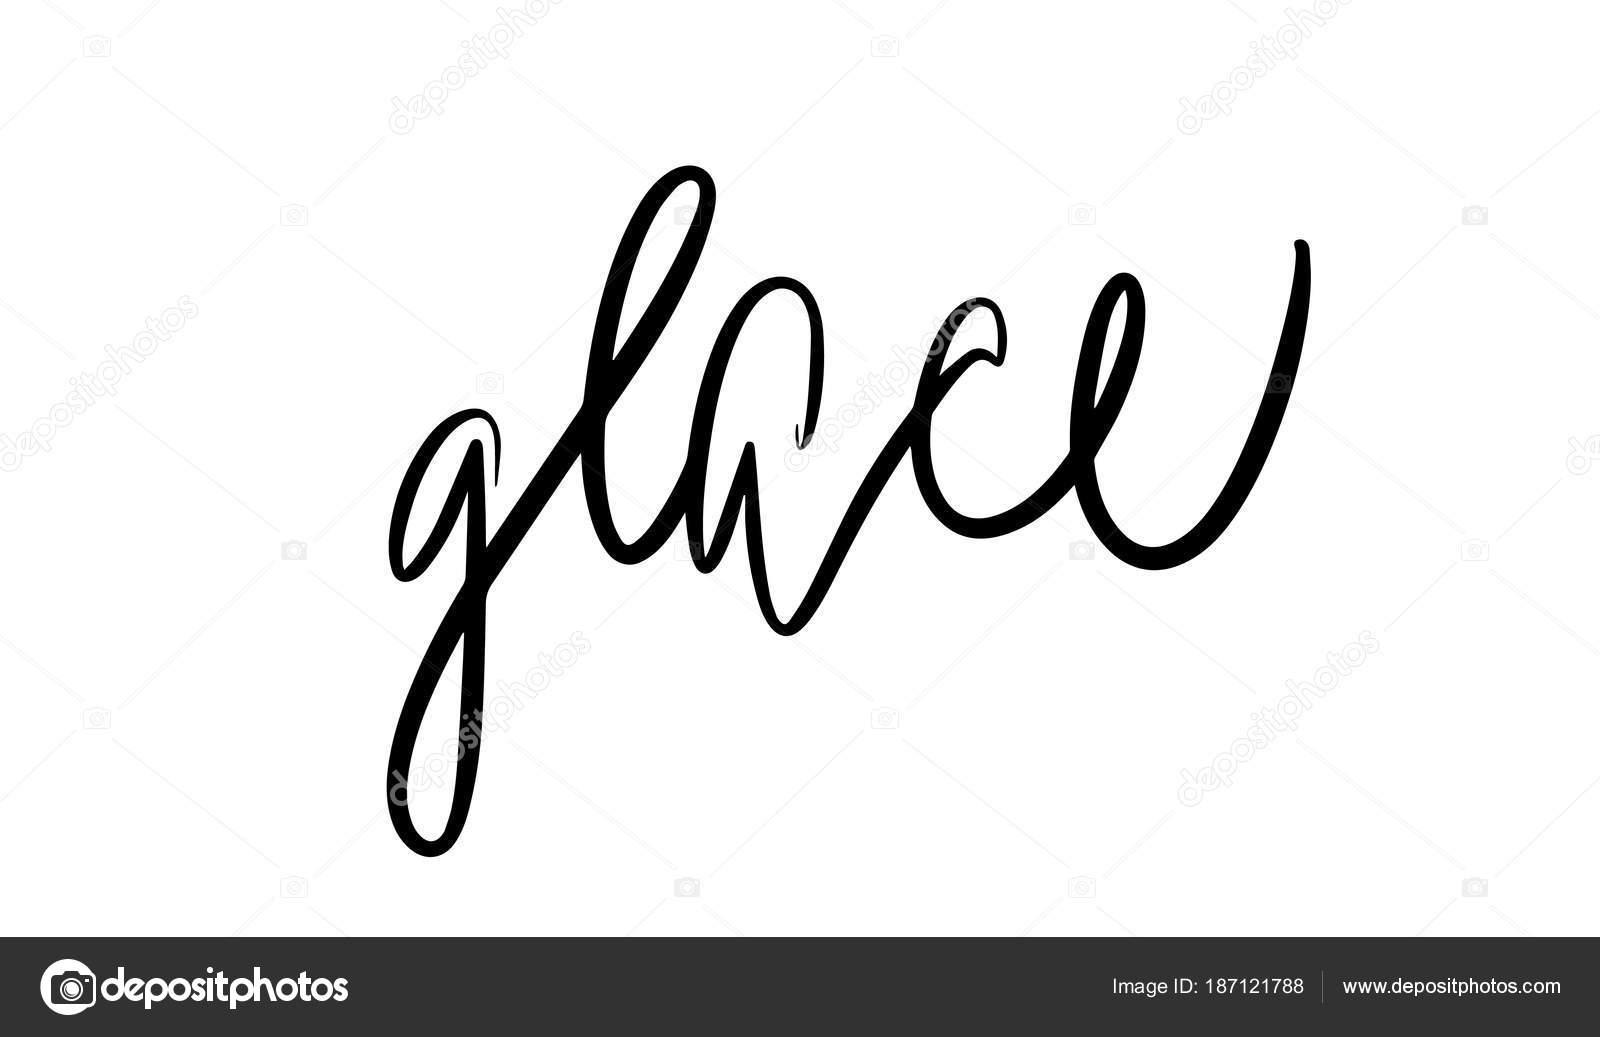 Glace lettering. Vector illustration of handwritten